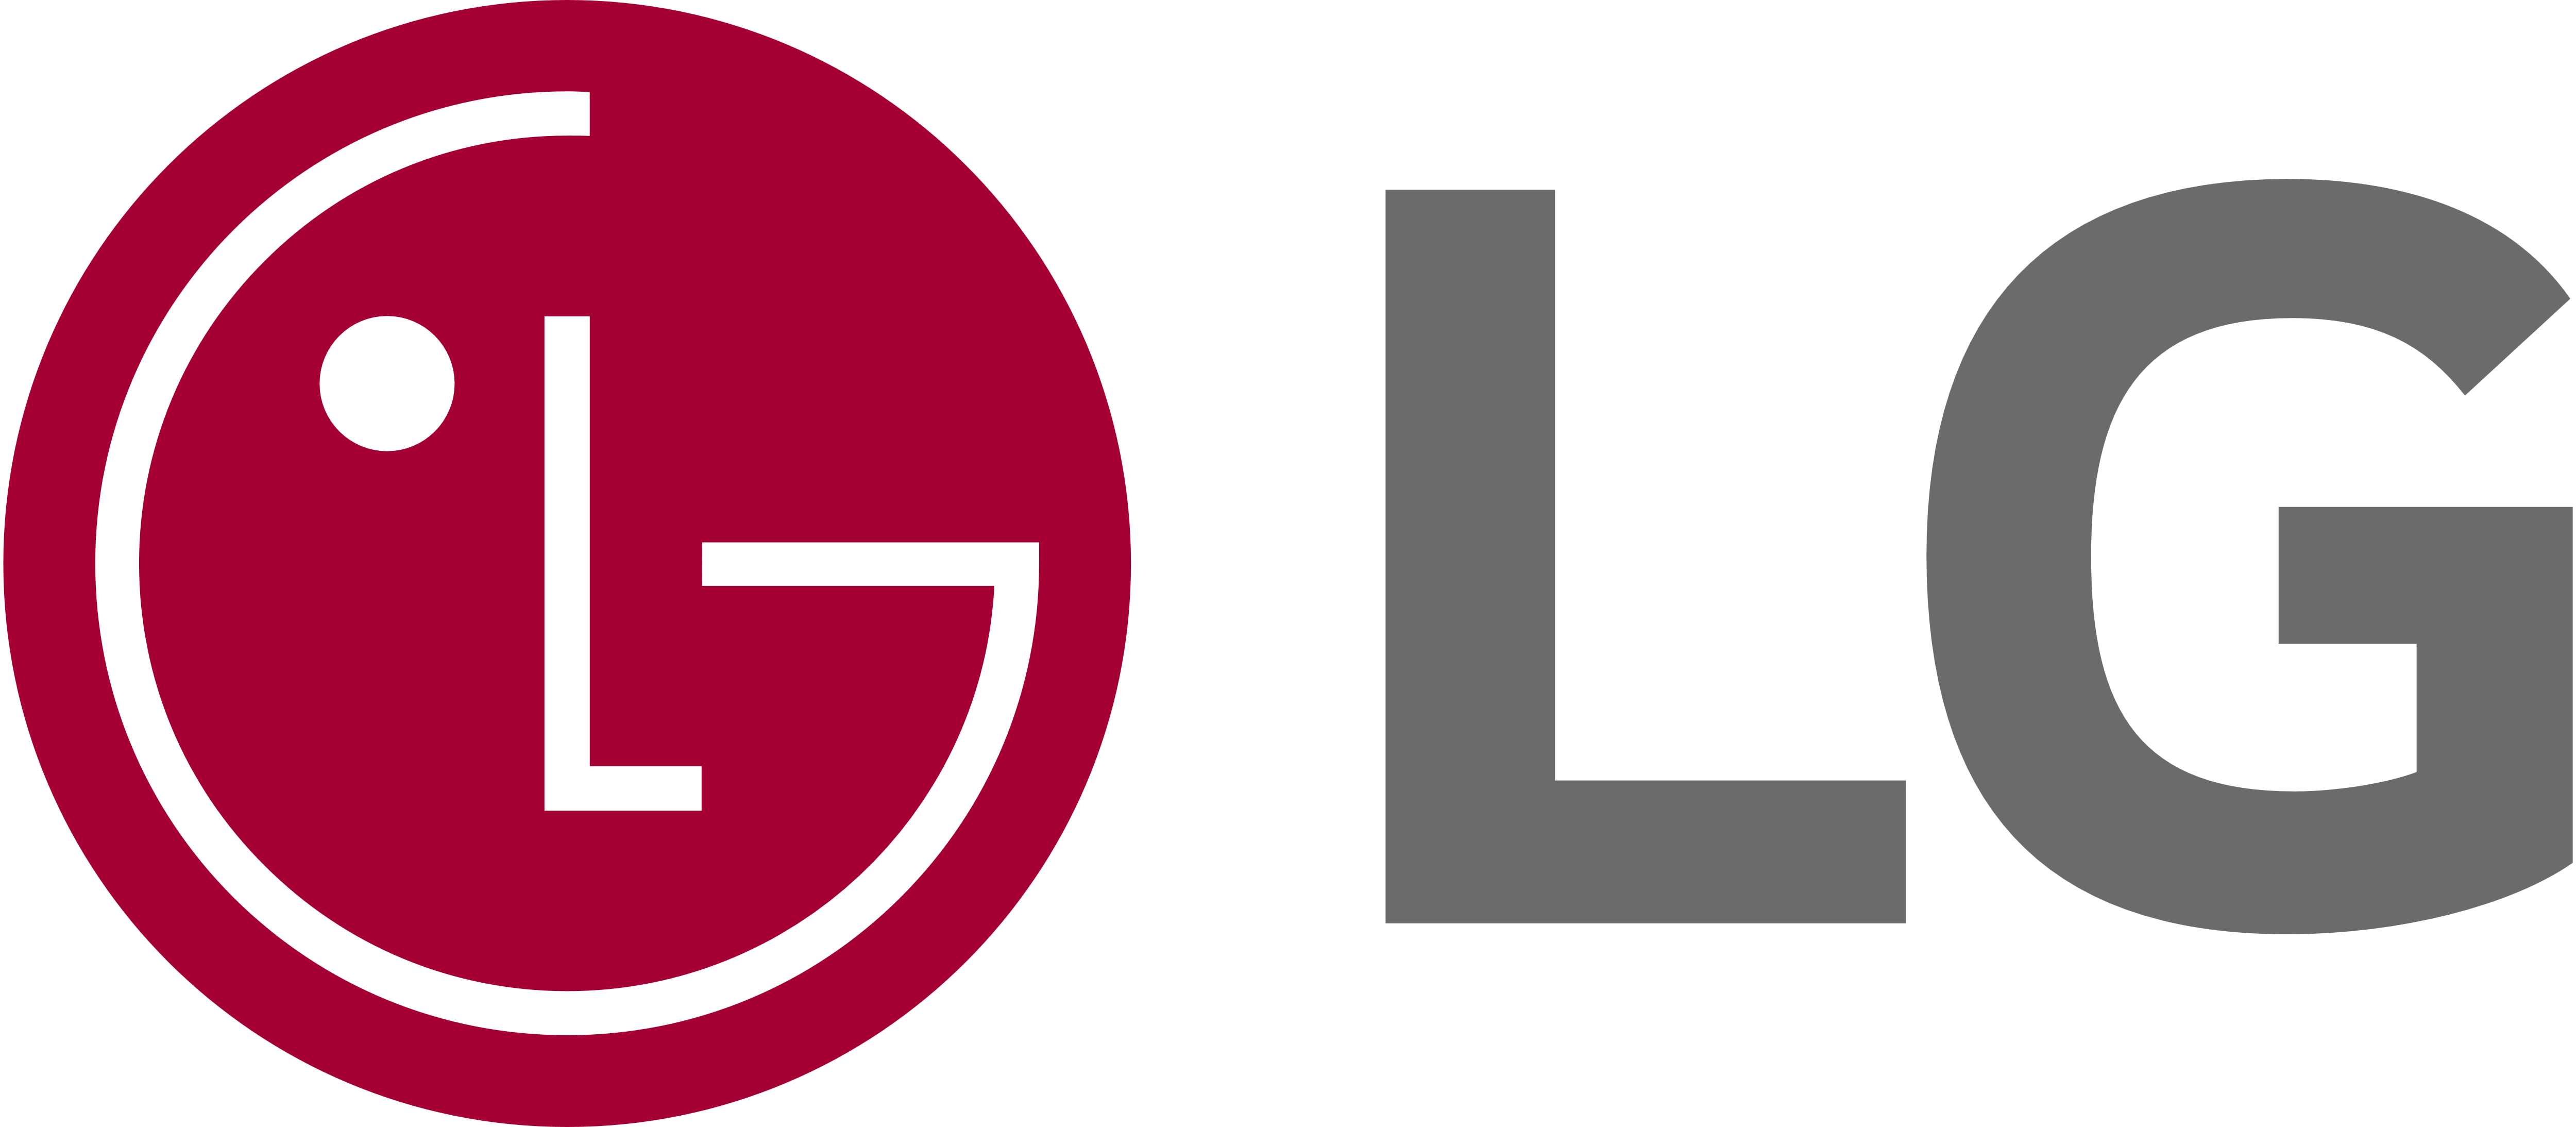 LG Washing Machine Service Number Burbank,